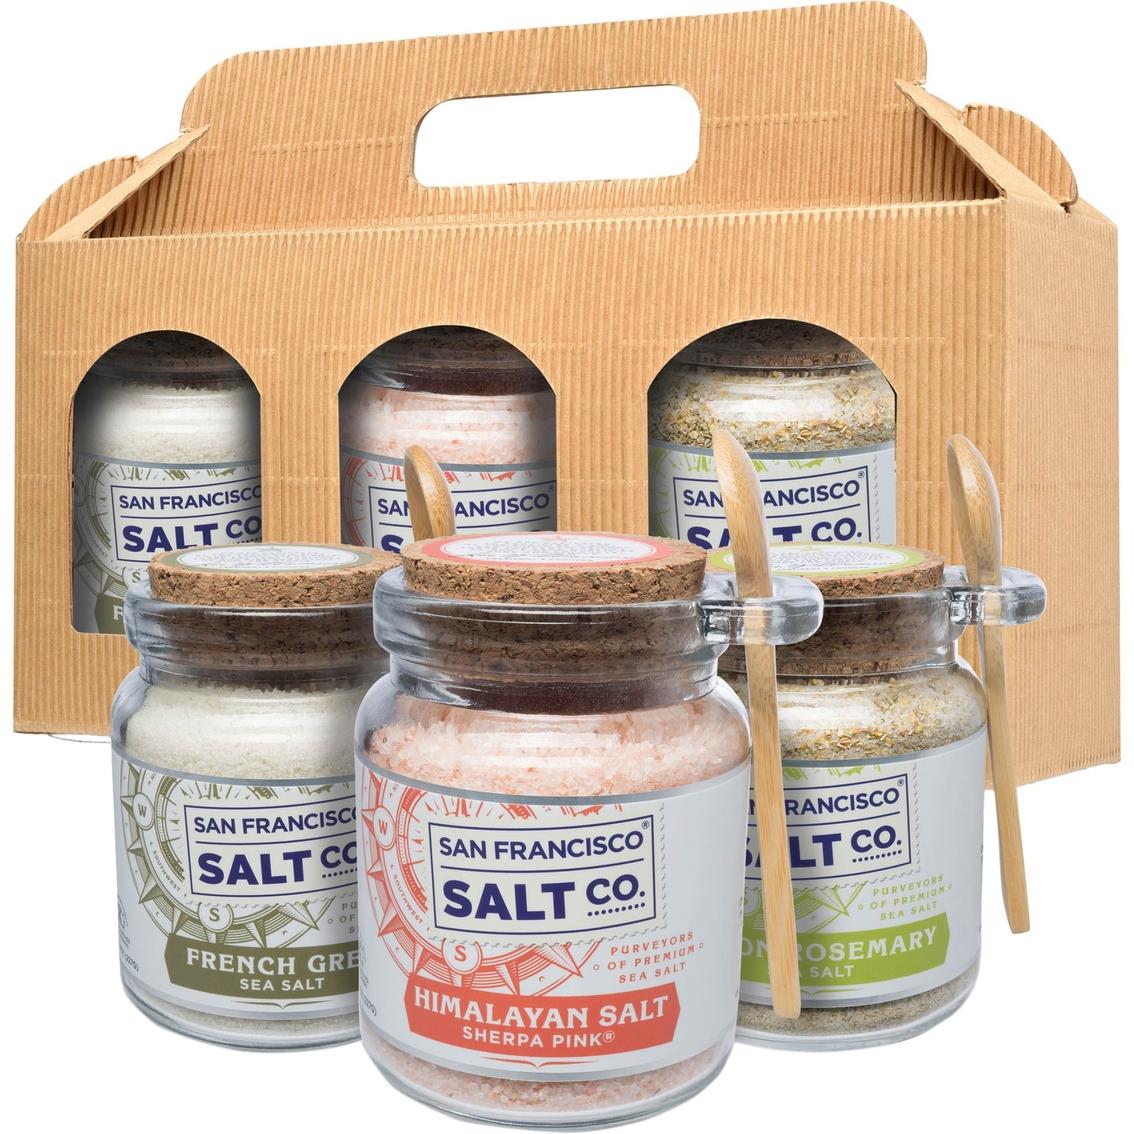 San Francisco Salt Company Gourmet Sea Salt in Chef Jars Gift 7 Pc. Set  sc 1 st  Exchange & San Francisco Salt Company Gourmet Sea Salt In Chef Jars Gift 7 Pc ...